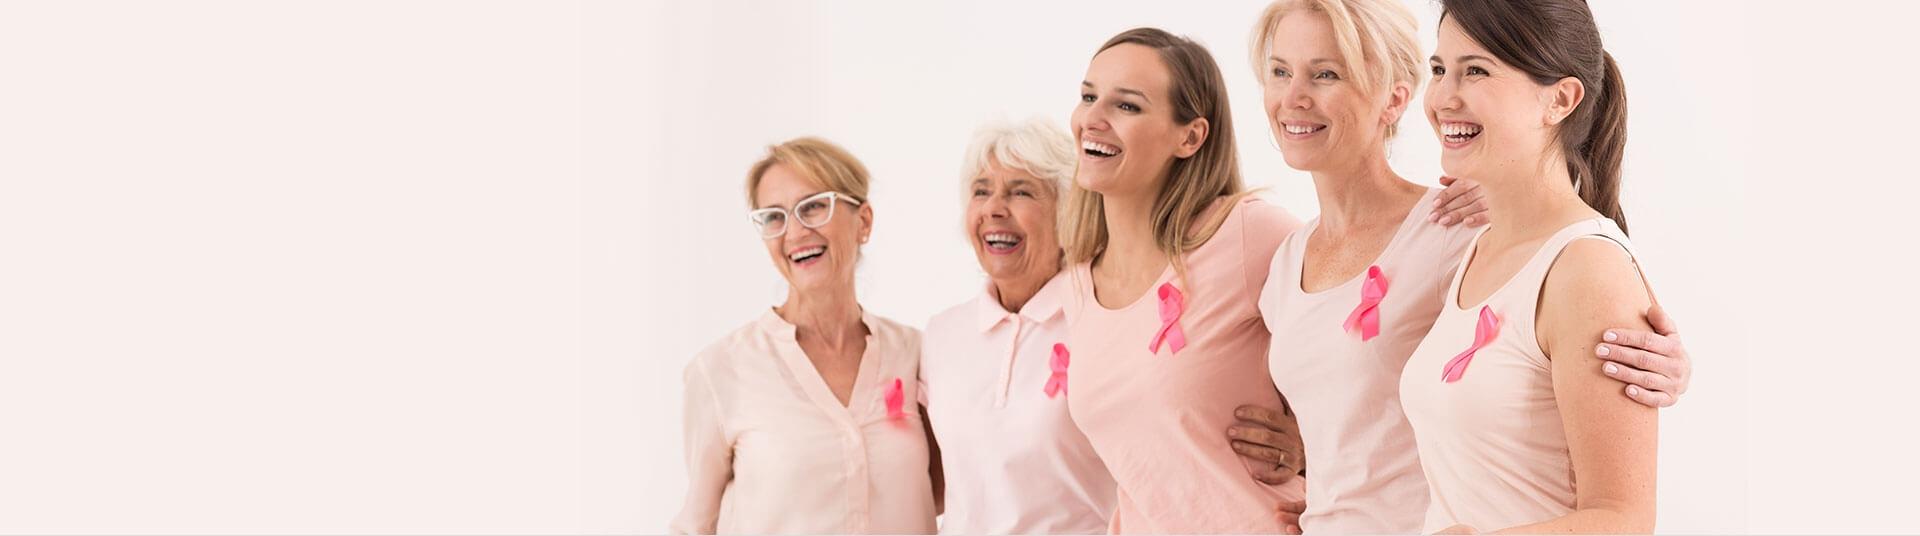 femei unite fundita roz cancer san voucher testare genetica up romania